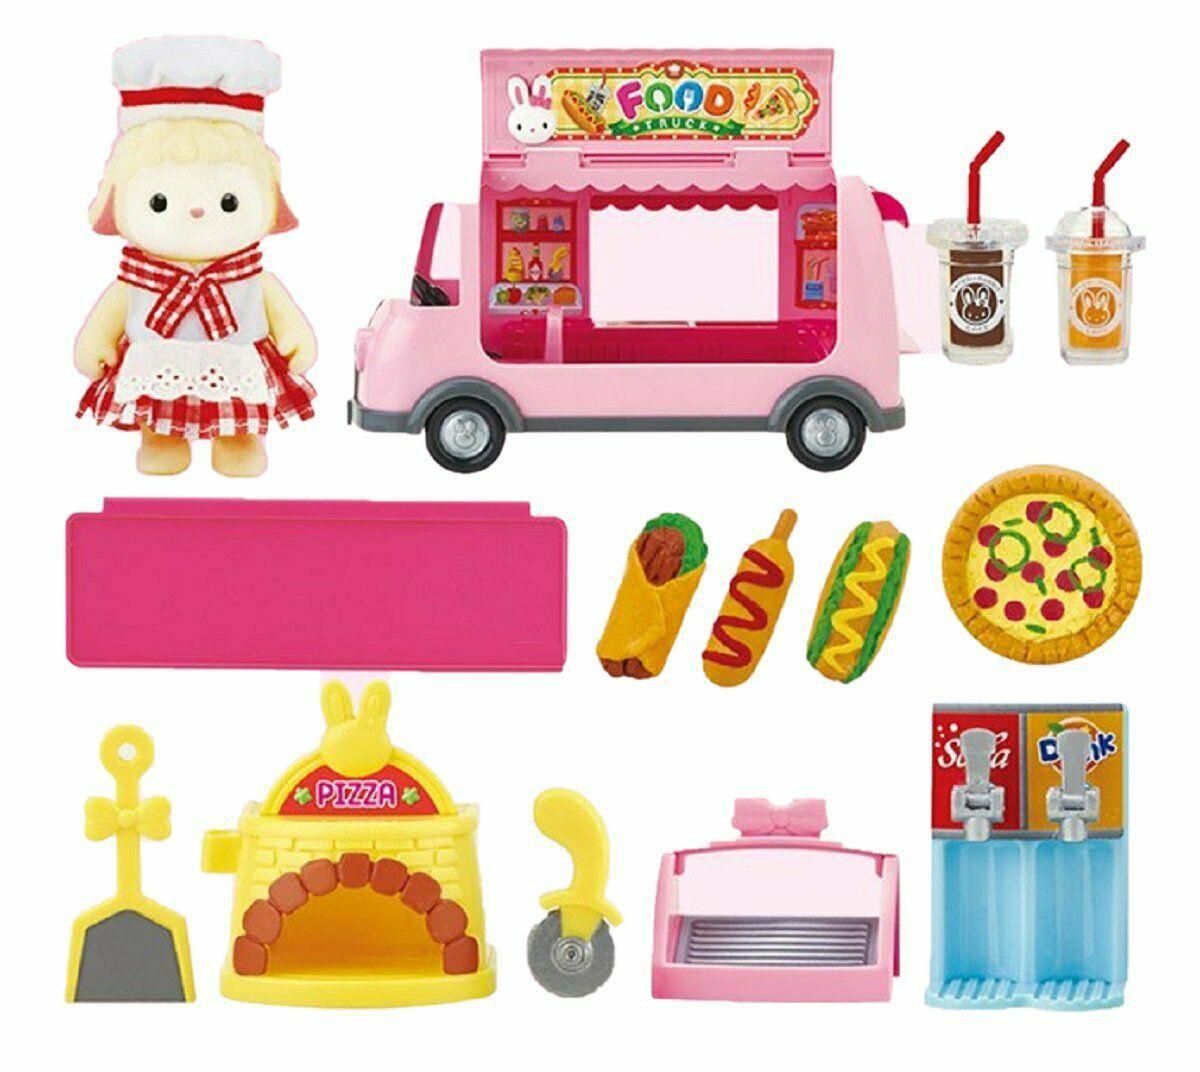 Konggi Rabbit Gurmi Sheep Food Truck Kitchen Doll Toy Roleplay Playset